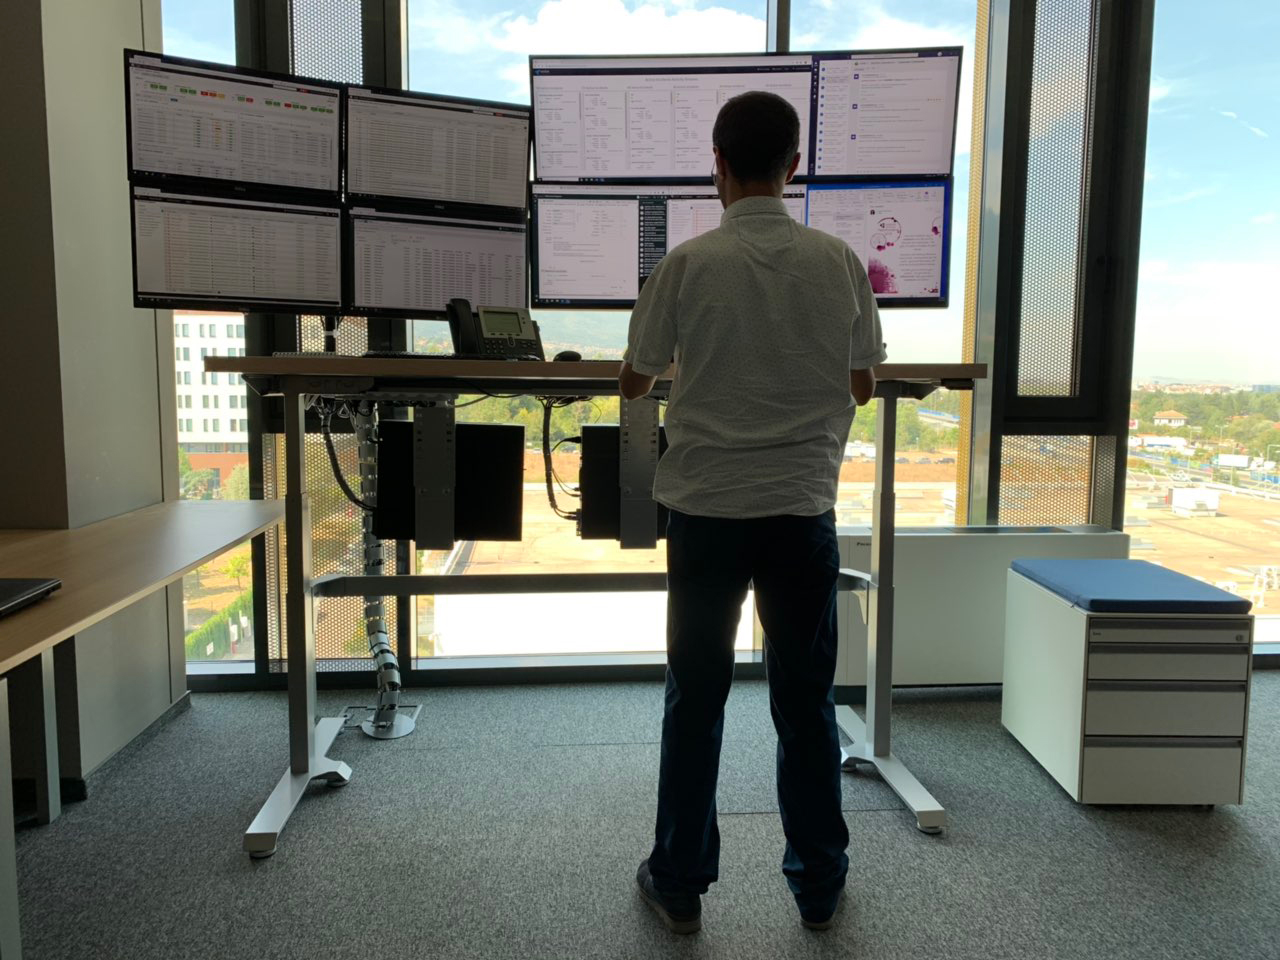 Height adjustable standing desk BulDesk Pro Plus in Telelink